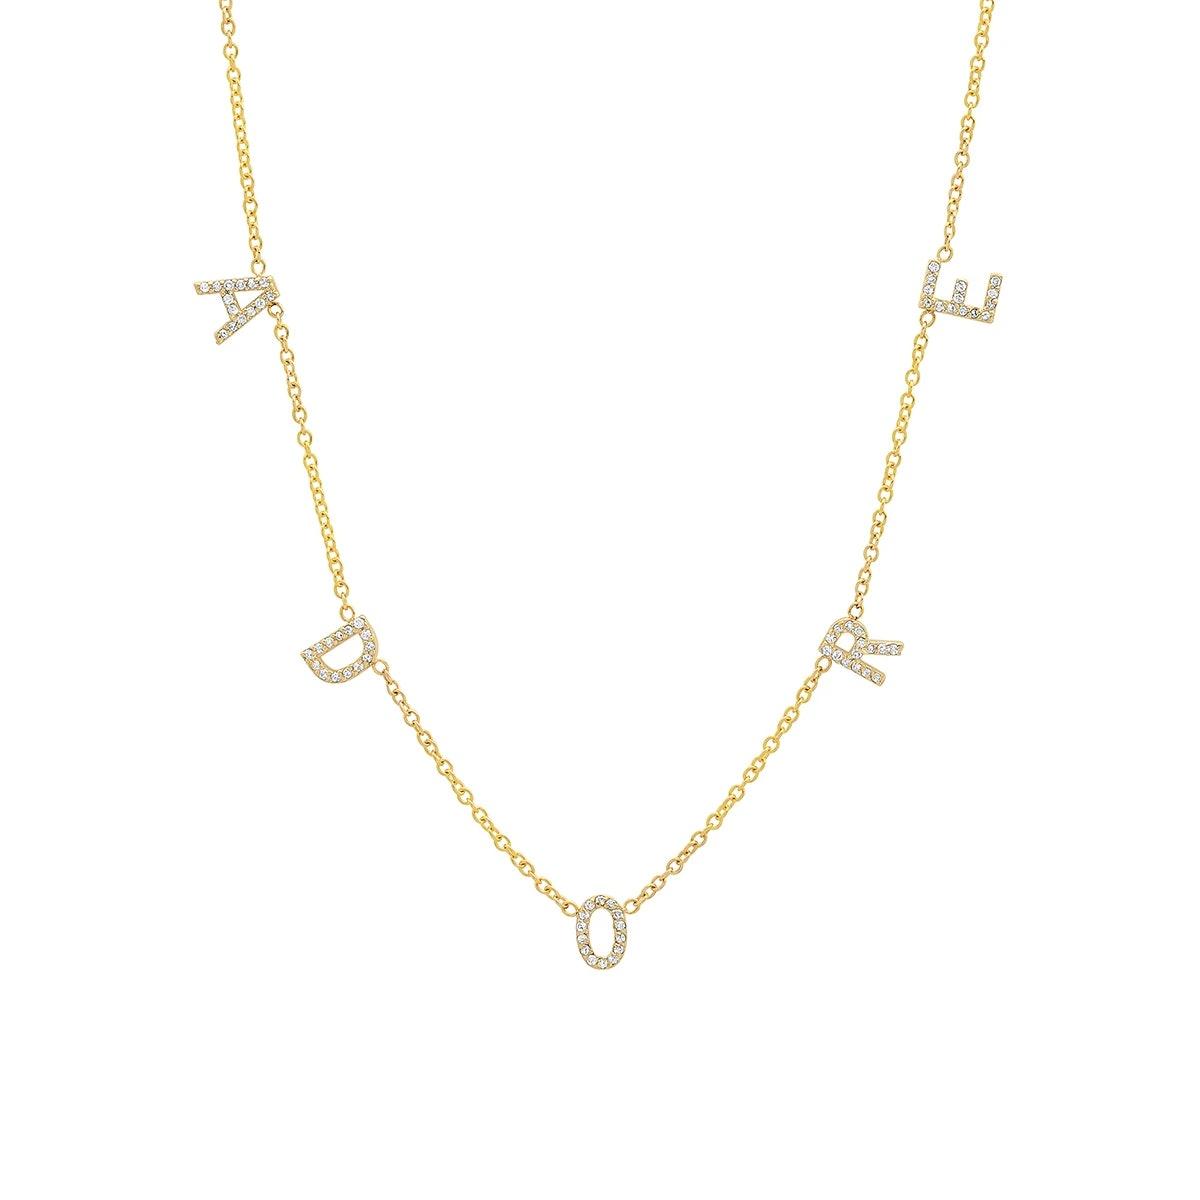 The Original Diamond Space Letter Necklace